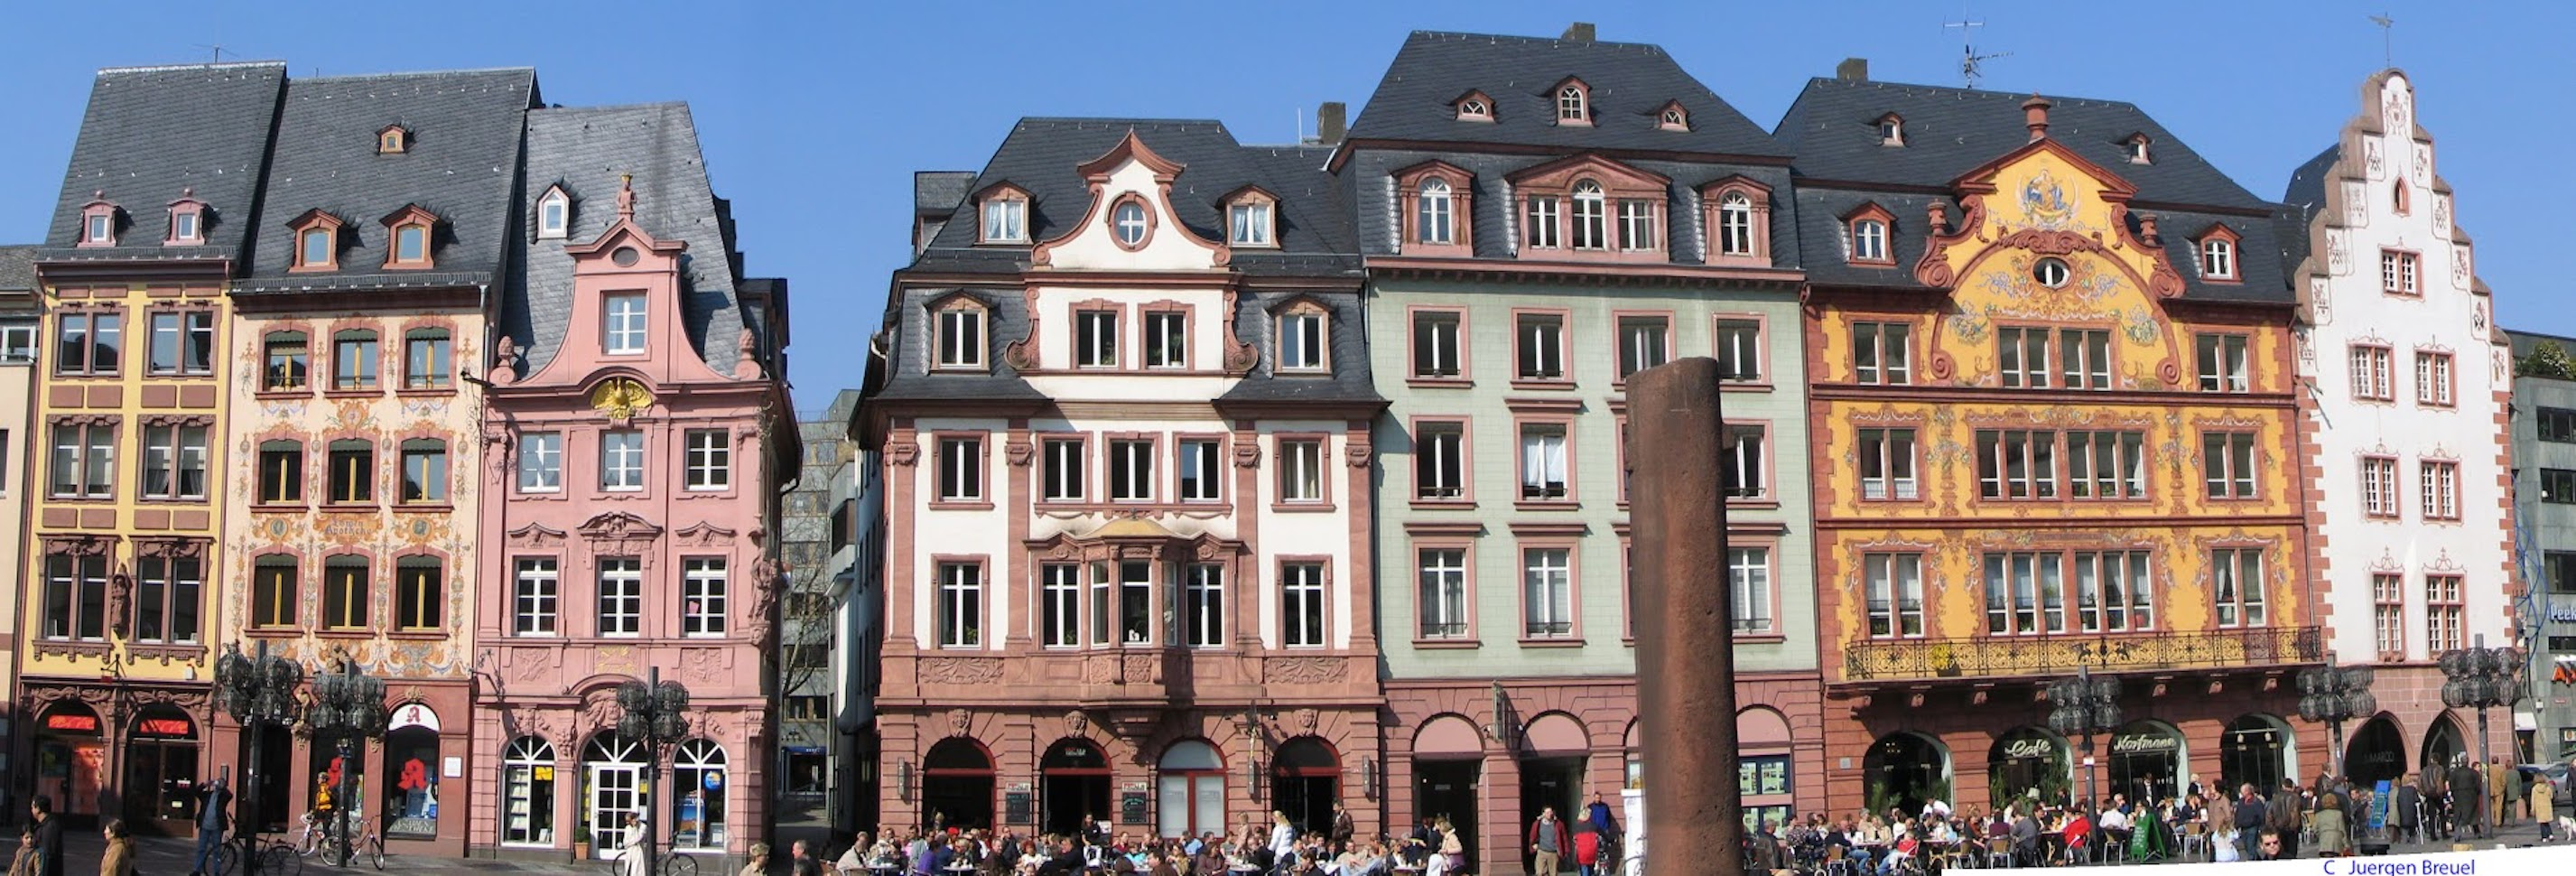 Study in Mainz